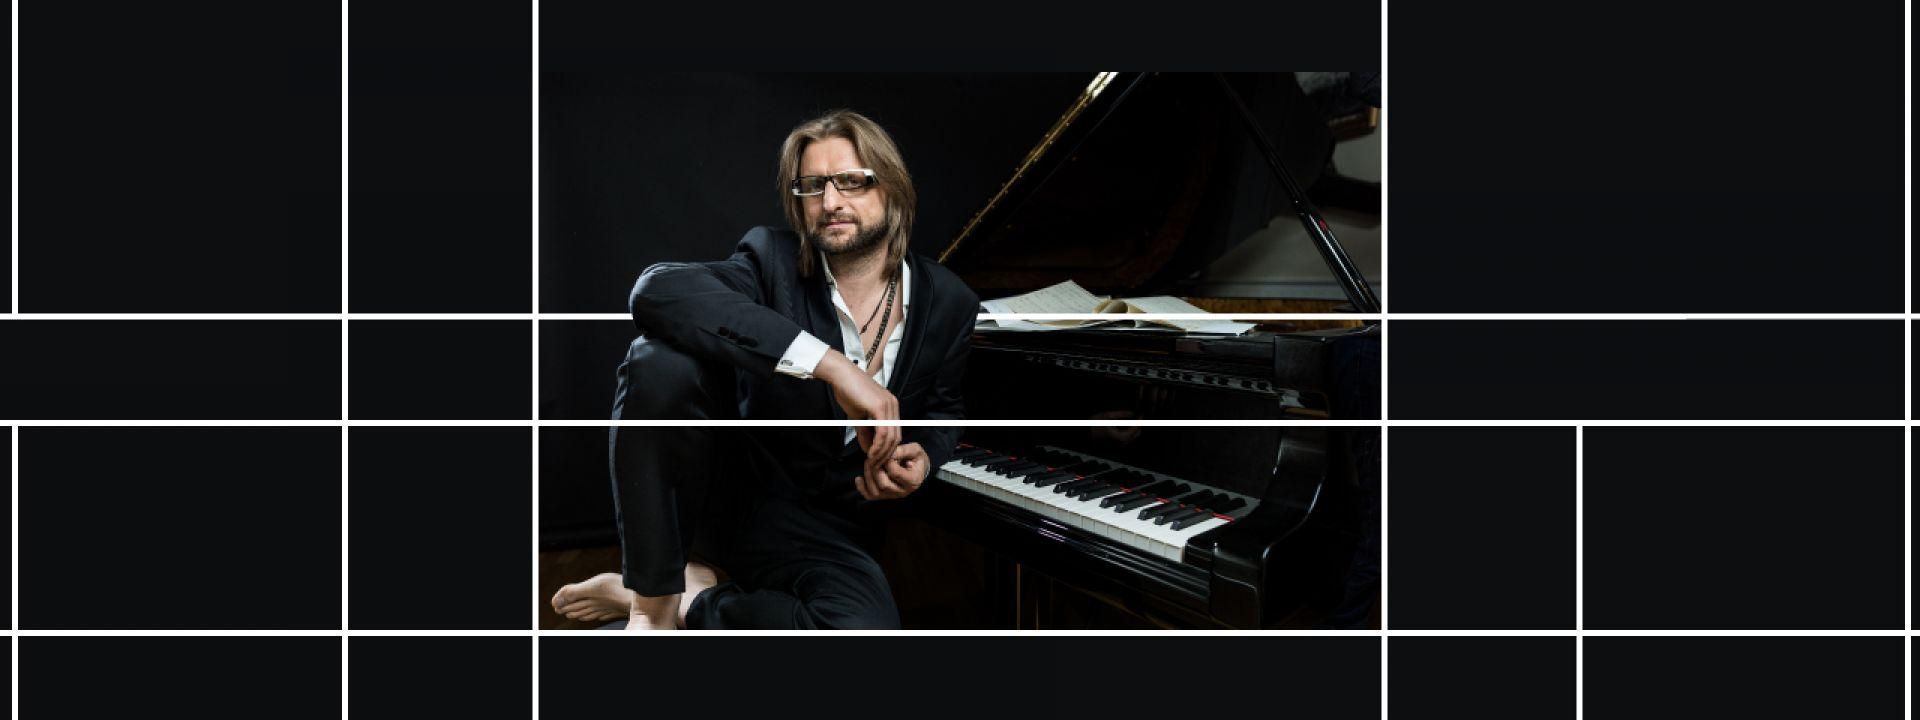 Leszek Możdżer: Πολωνός τζαζ πιανίστας